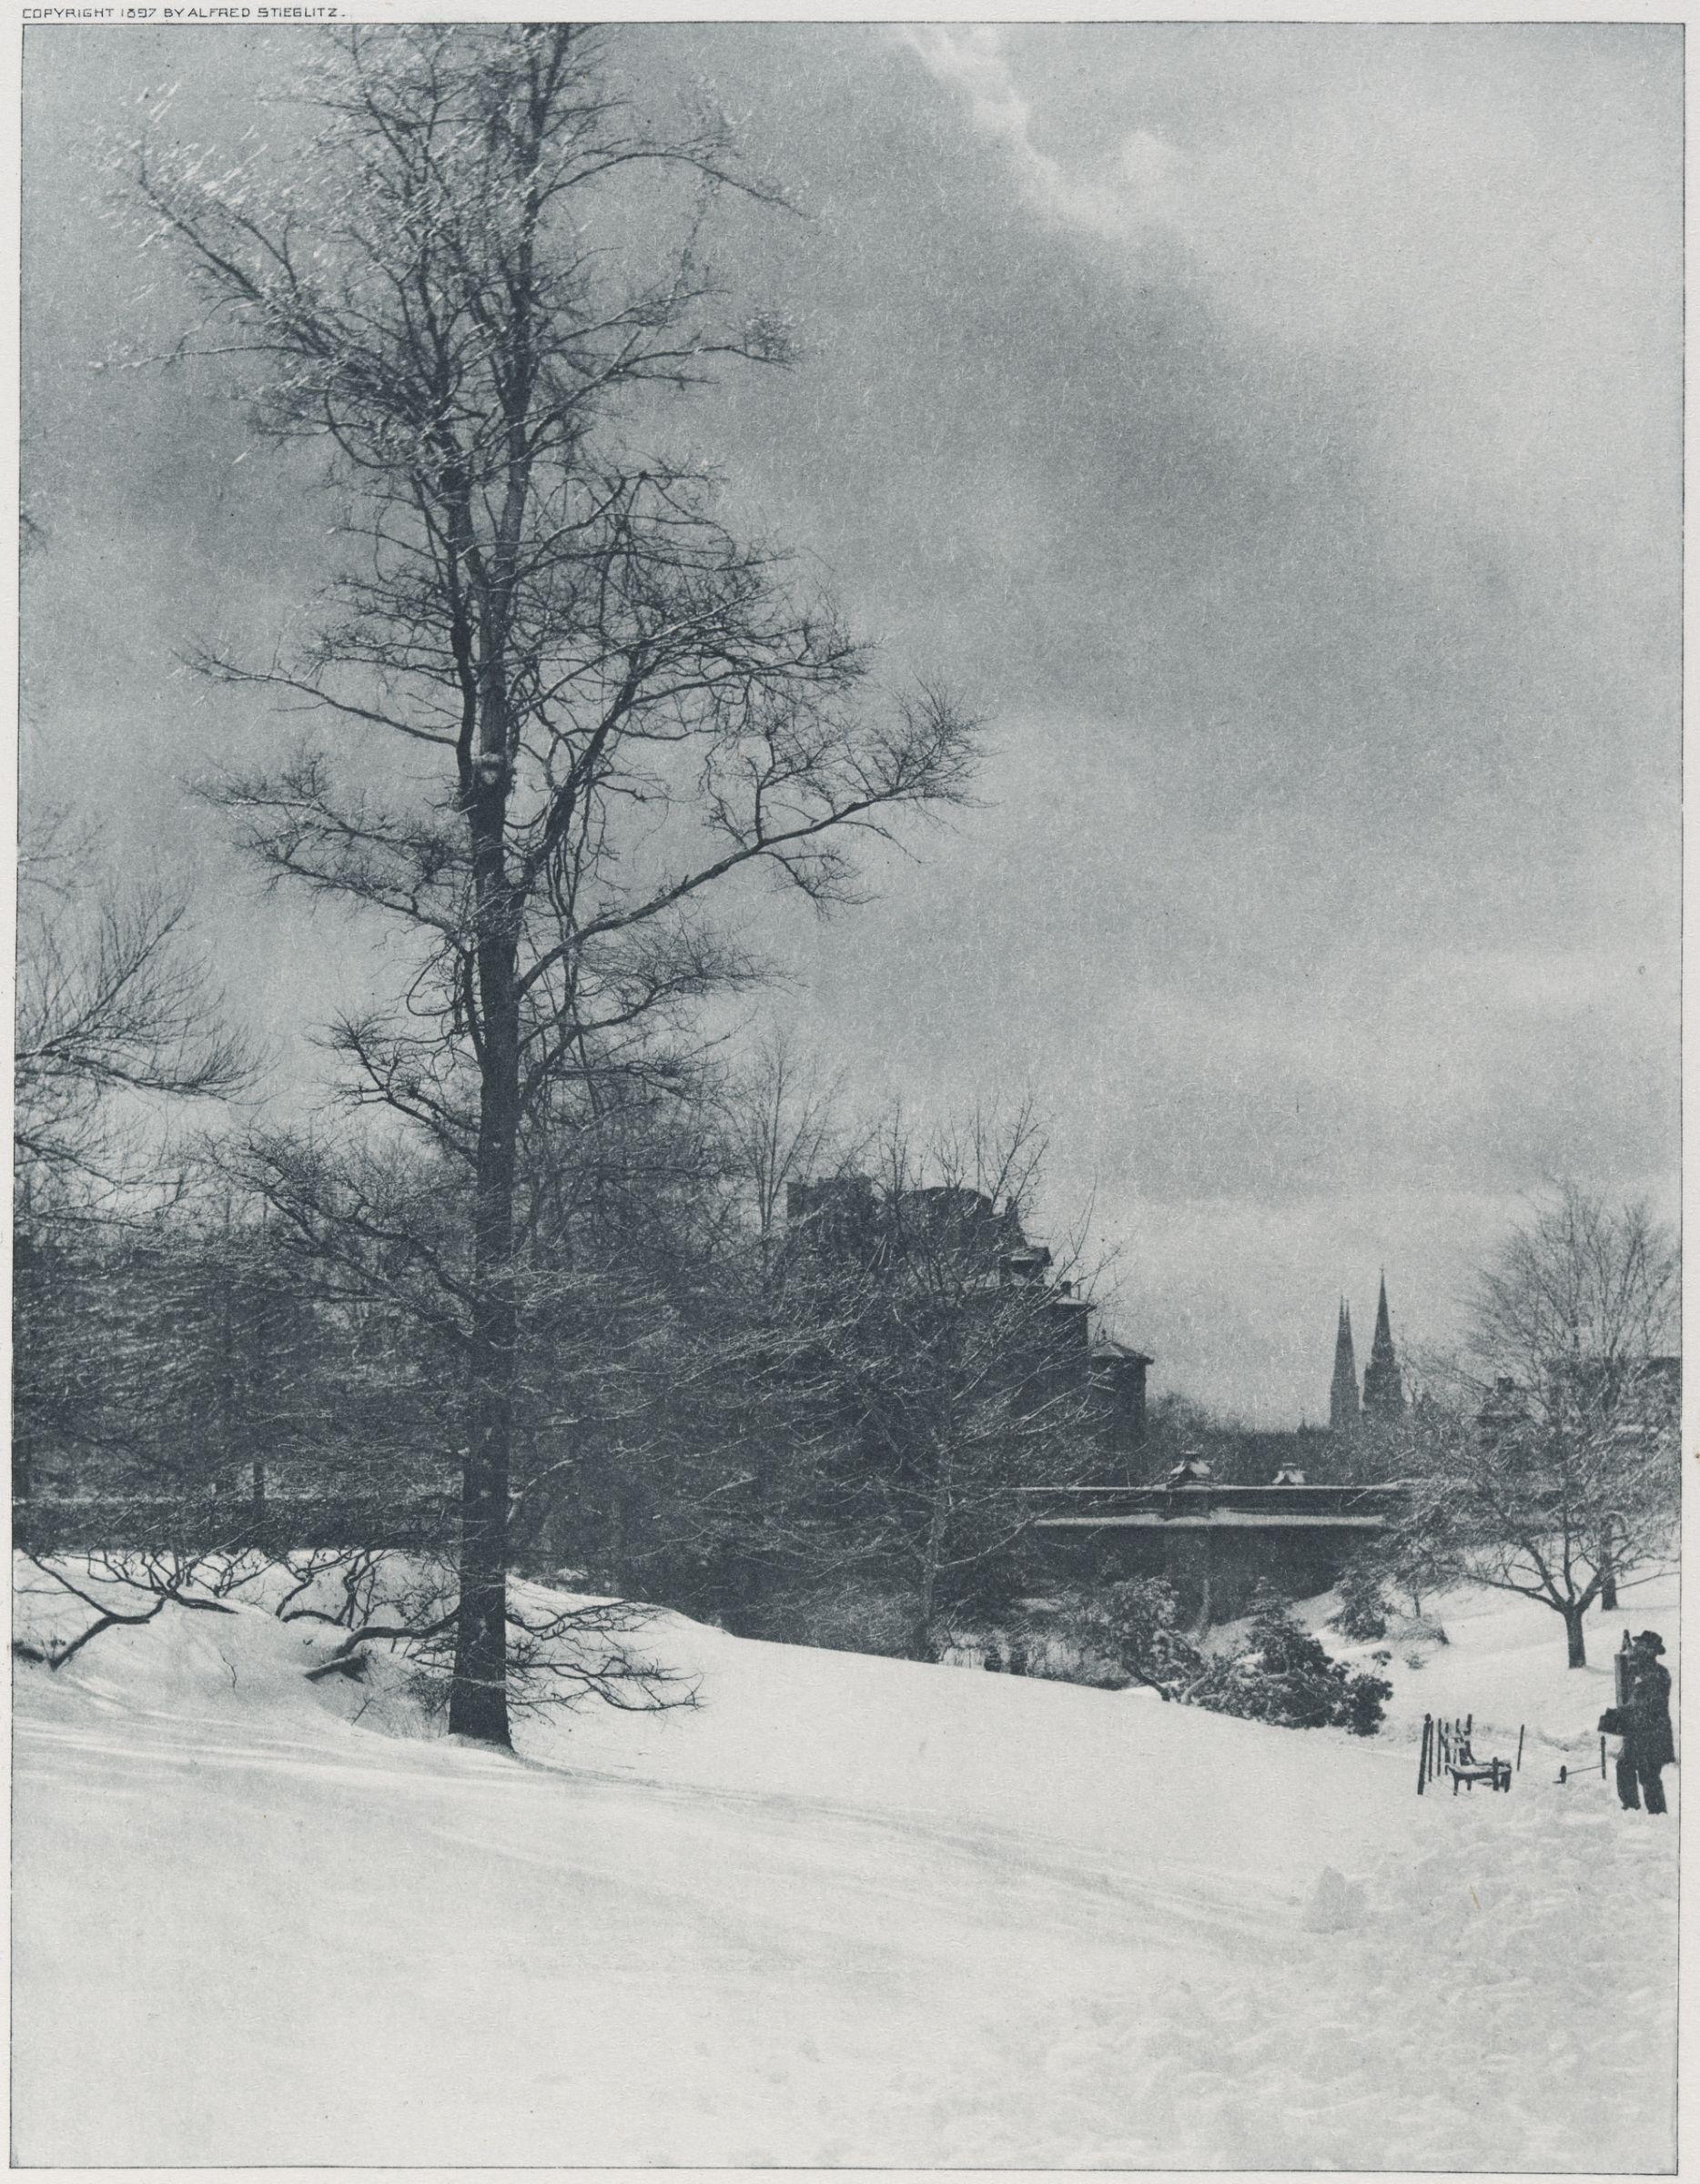 1897. Зимнее небо. Центральный парк